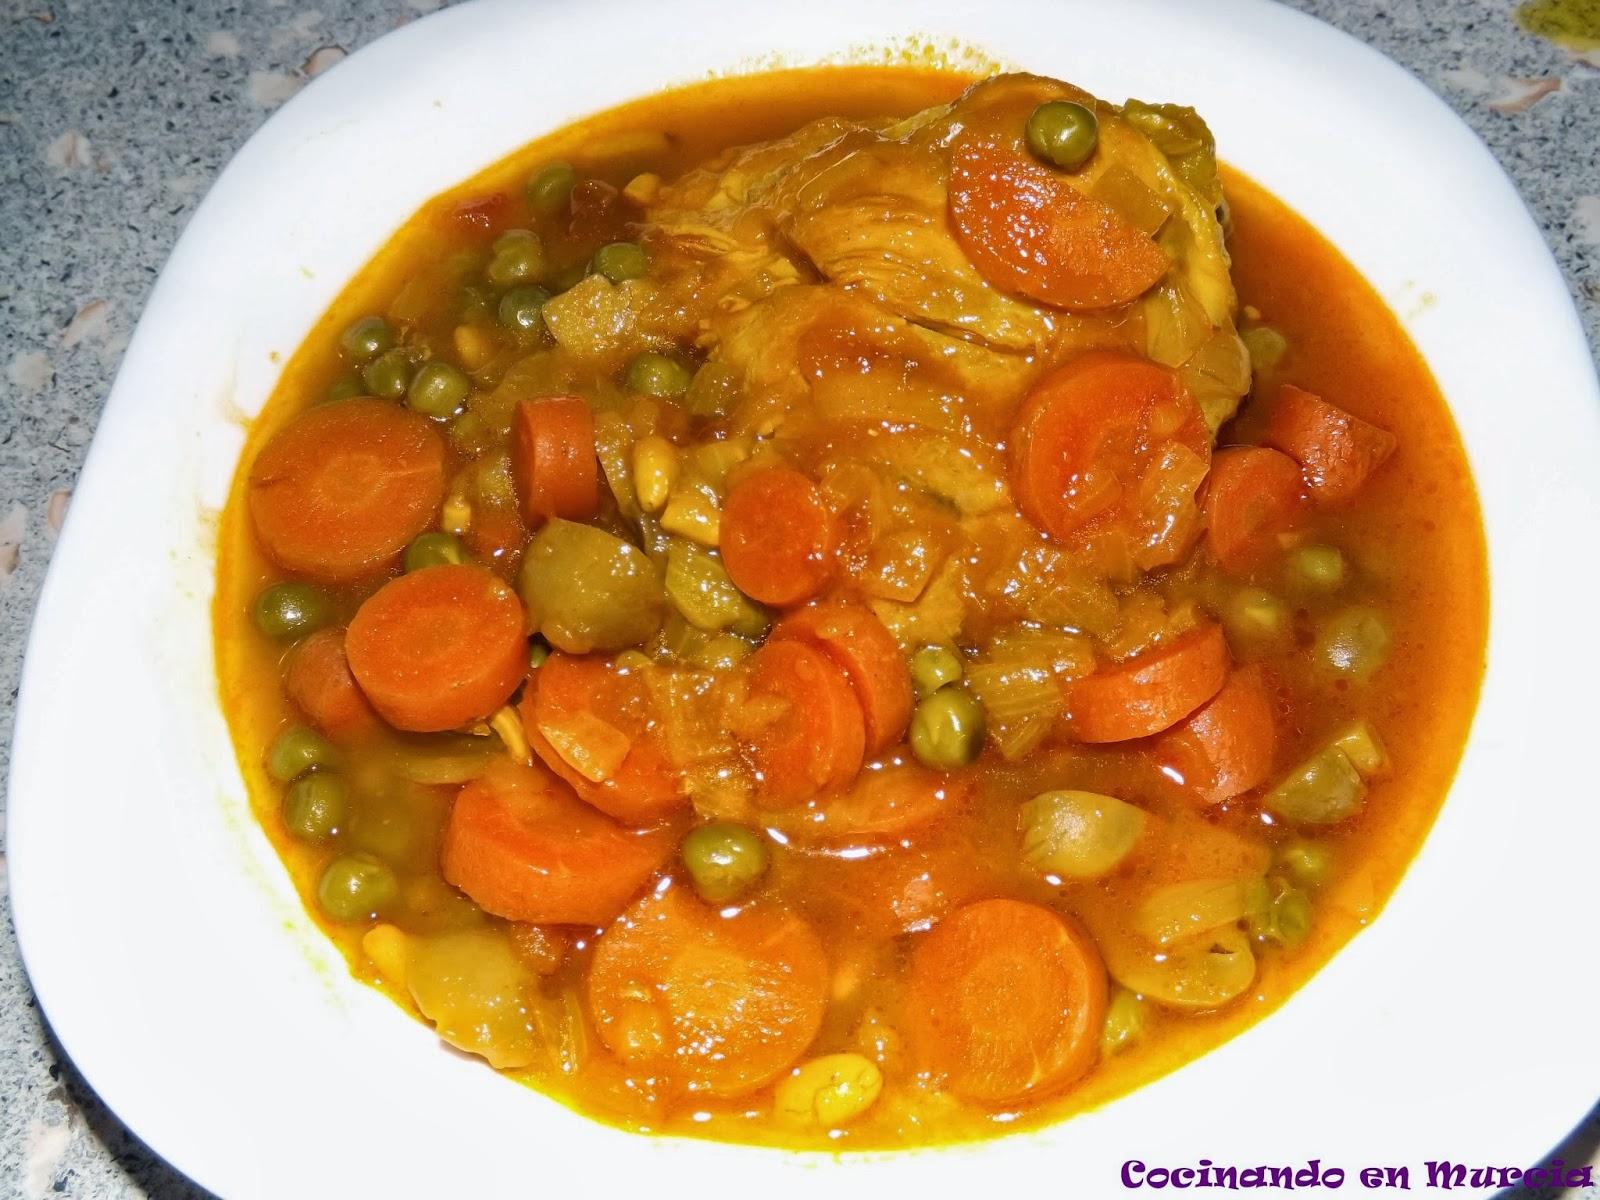 Cocinando en murcia muslos de pollo en salsa for Muslos pollo en salsa